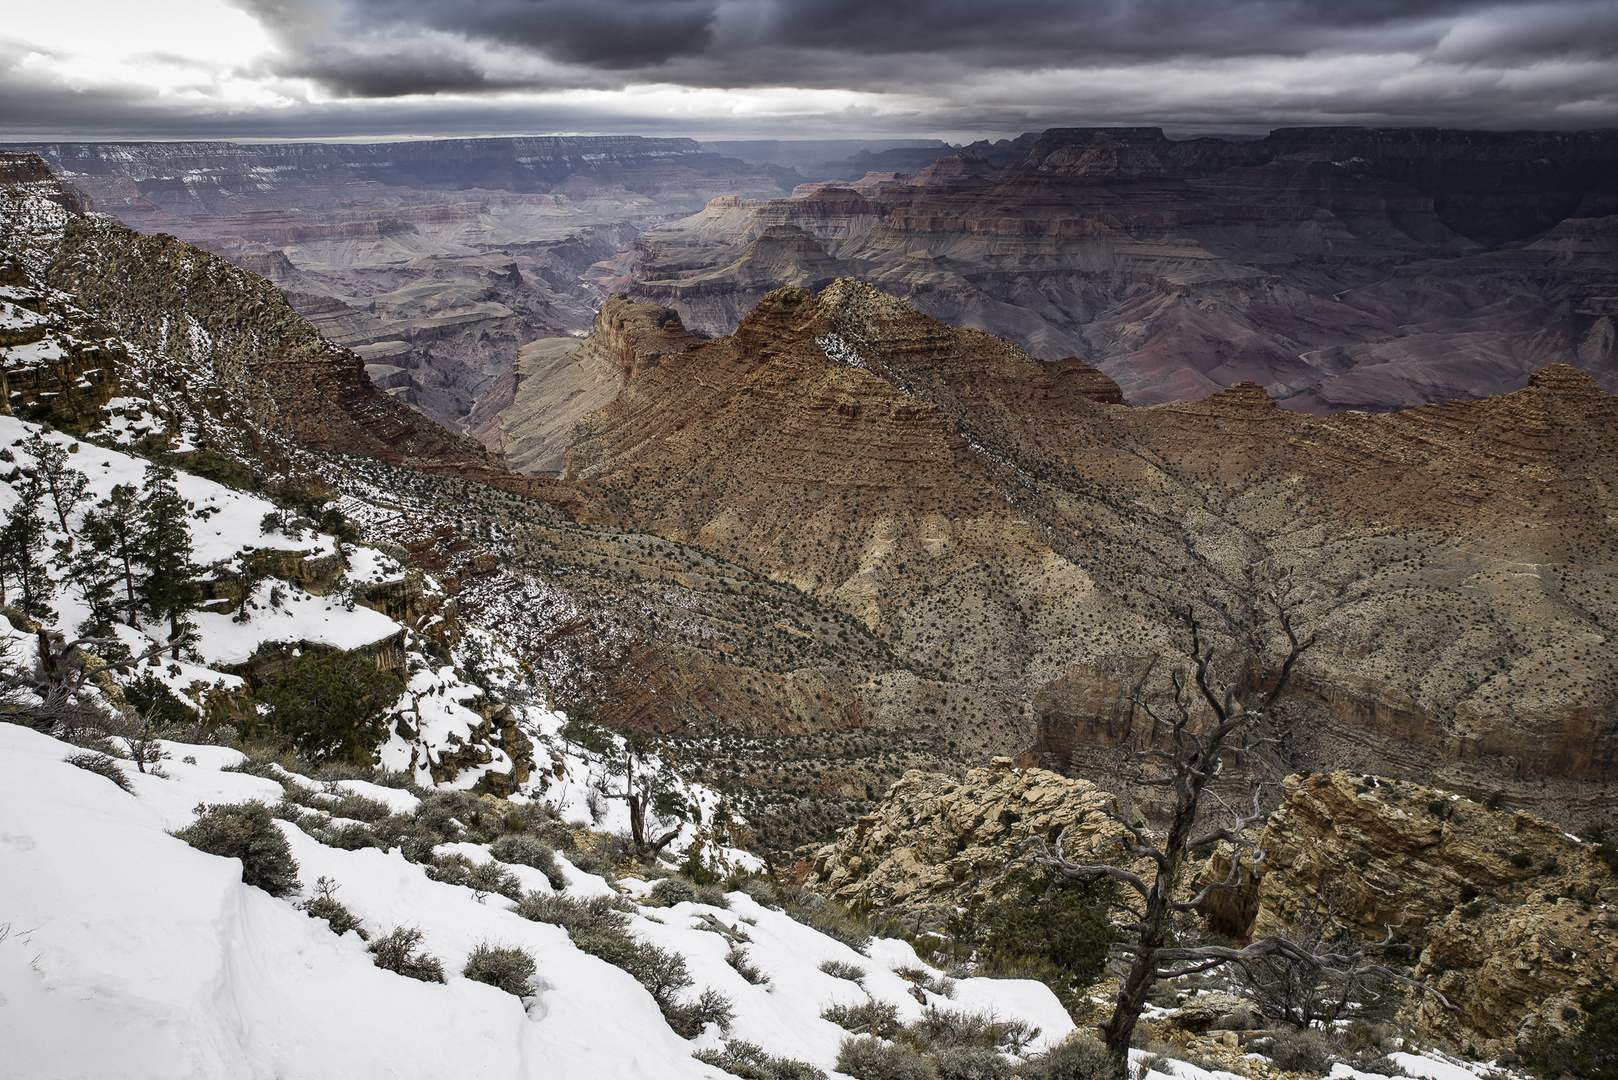 Dunkle Wolken über dem Grand Canyon